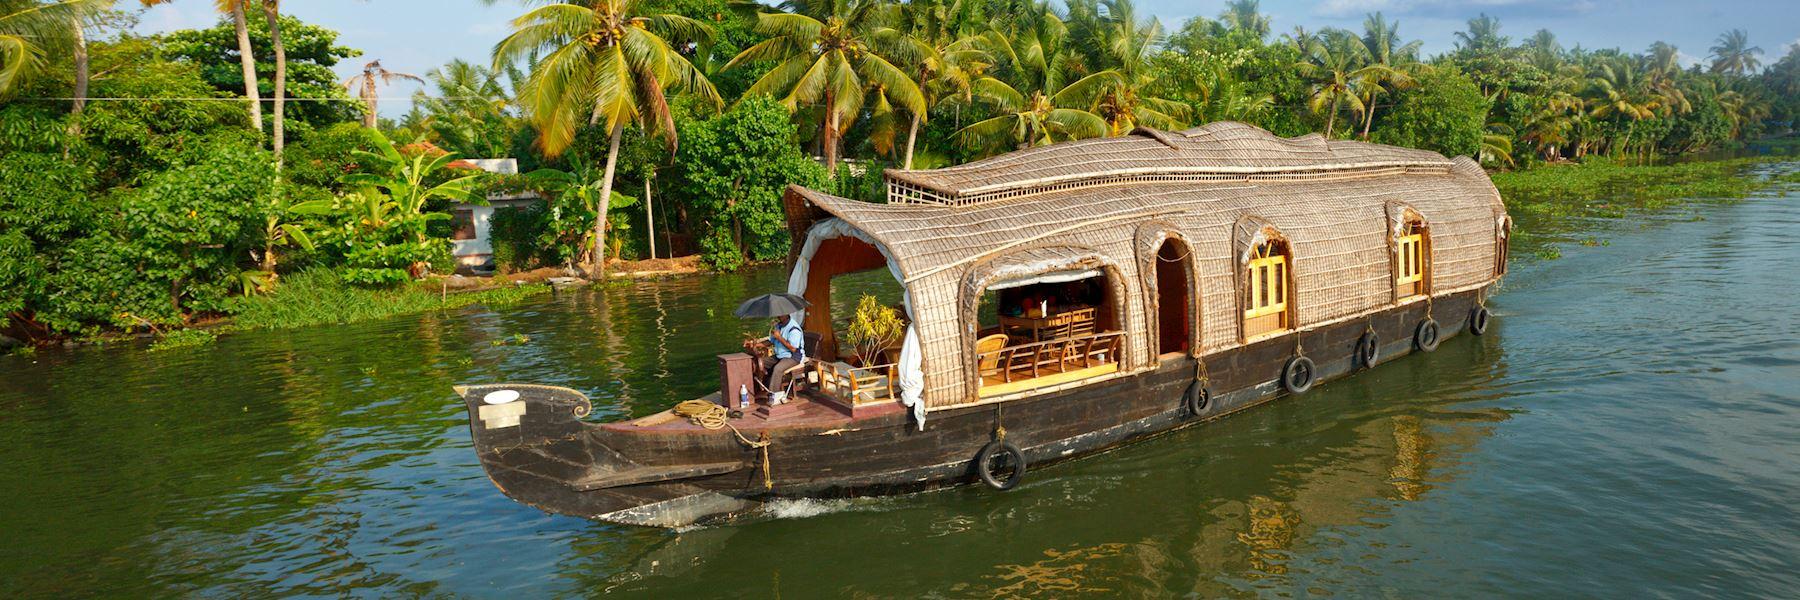 Keralan Houseboats (Rice barges)